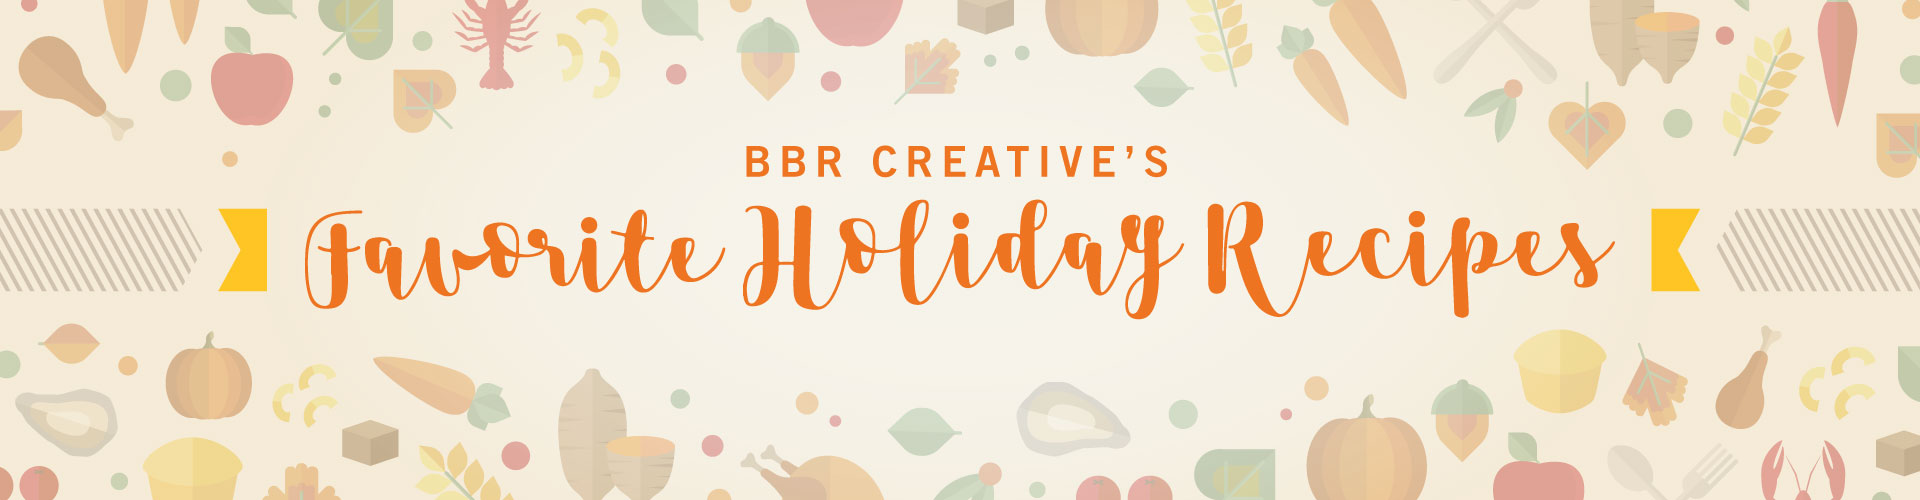 16-150-1251-BBR-November-2016-Blog-Graphics_Recipes-Banner.jpg